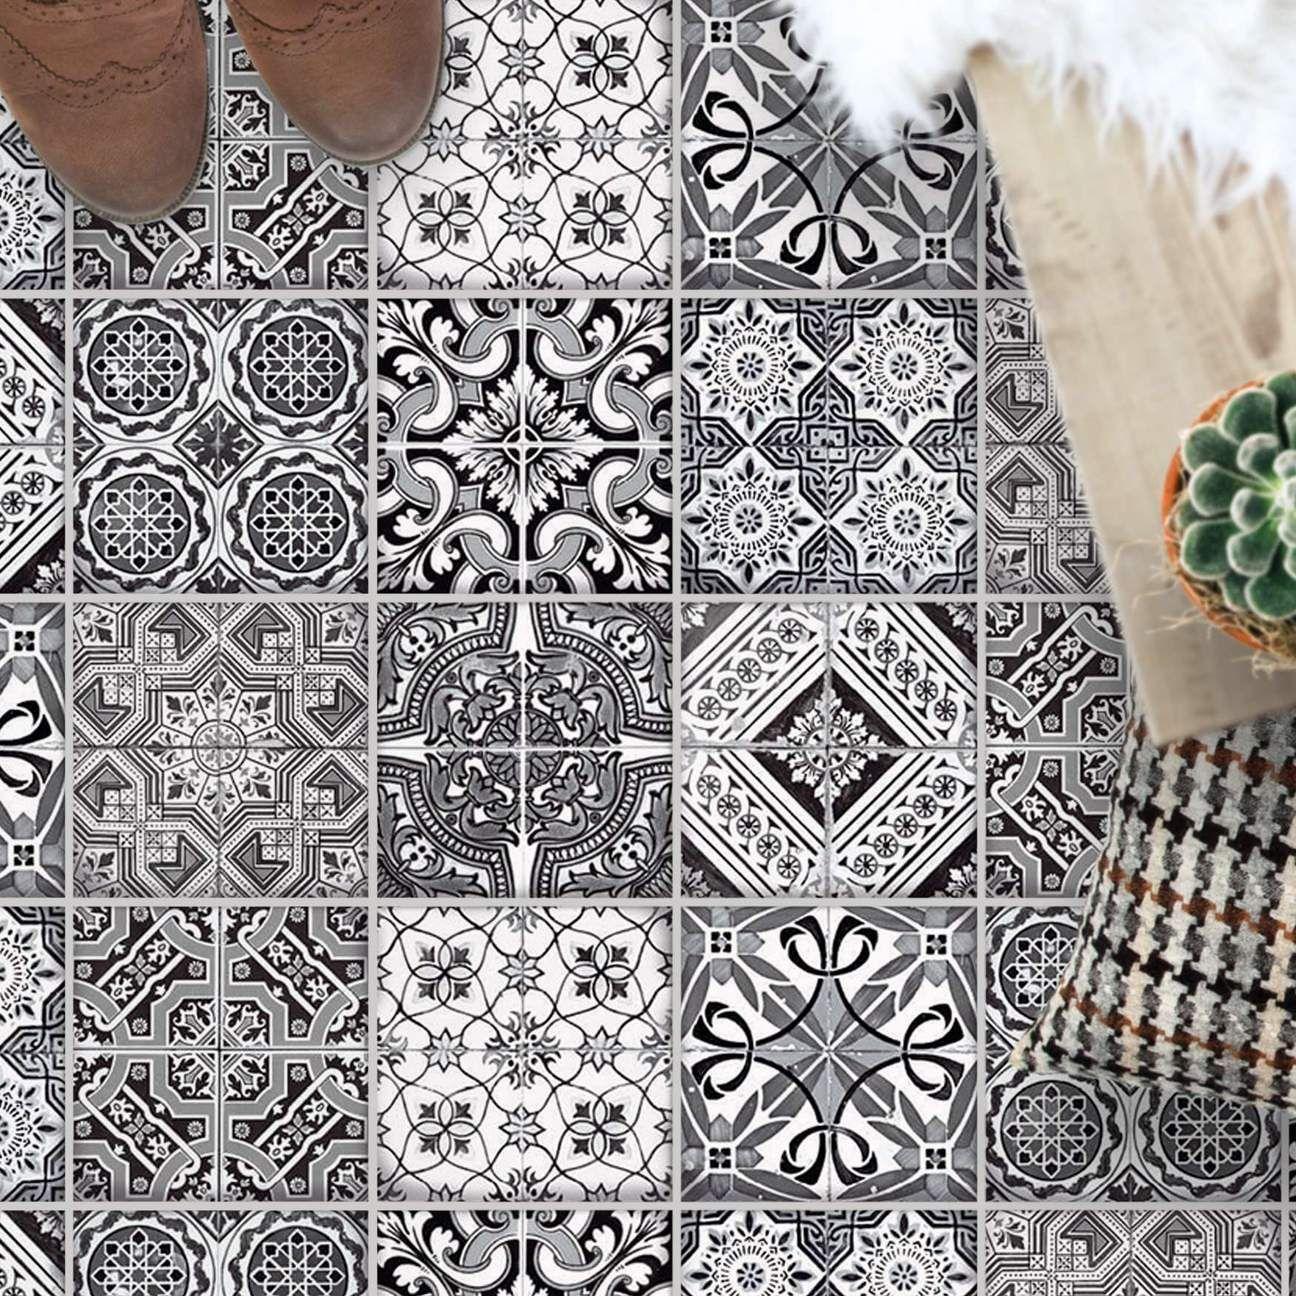 Fliesenaufkleber Boden Fur Kuche Bad Design Black N White Fliesenaufkleber Boden Fliesenaufkleber Klebefliesen